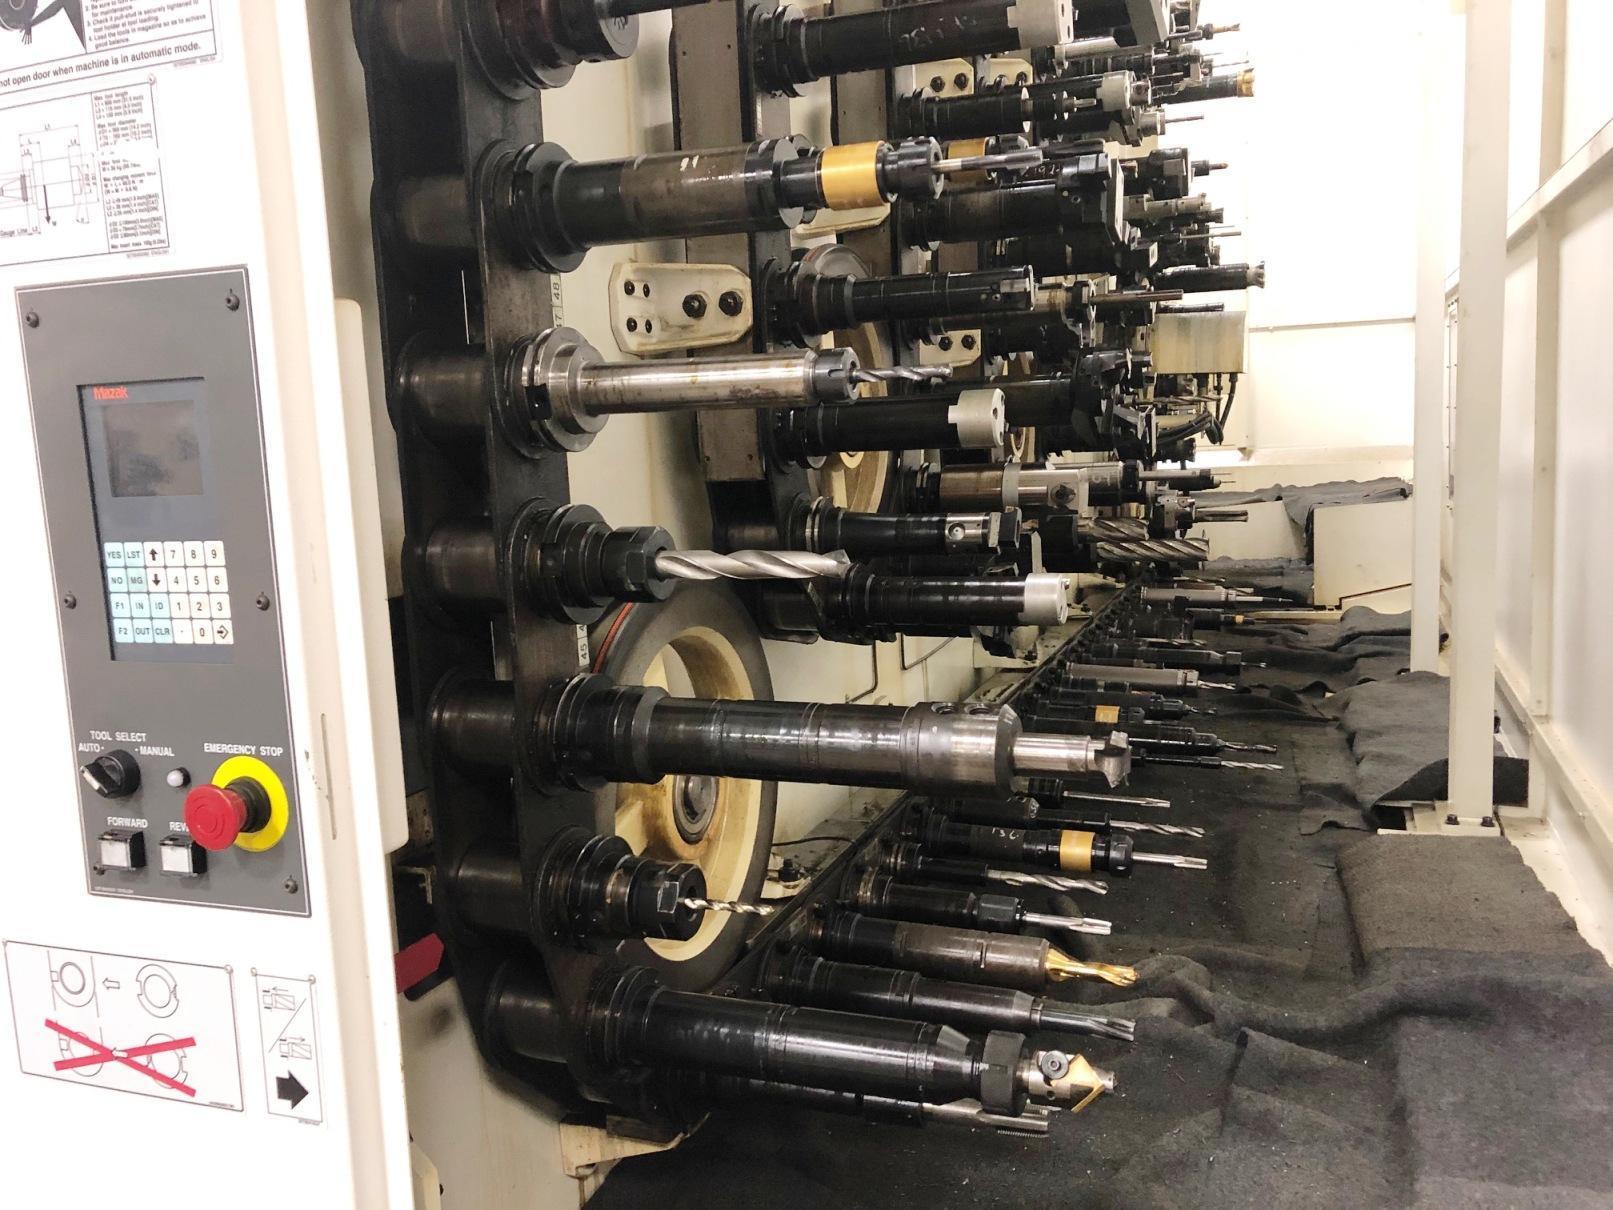 MAZAK HCN 12800 HORIZONTAL MACHINING CENTER